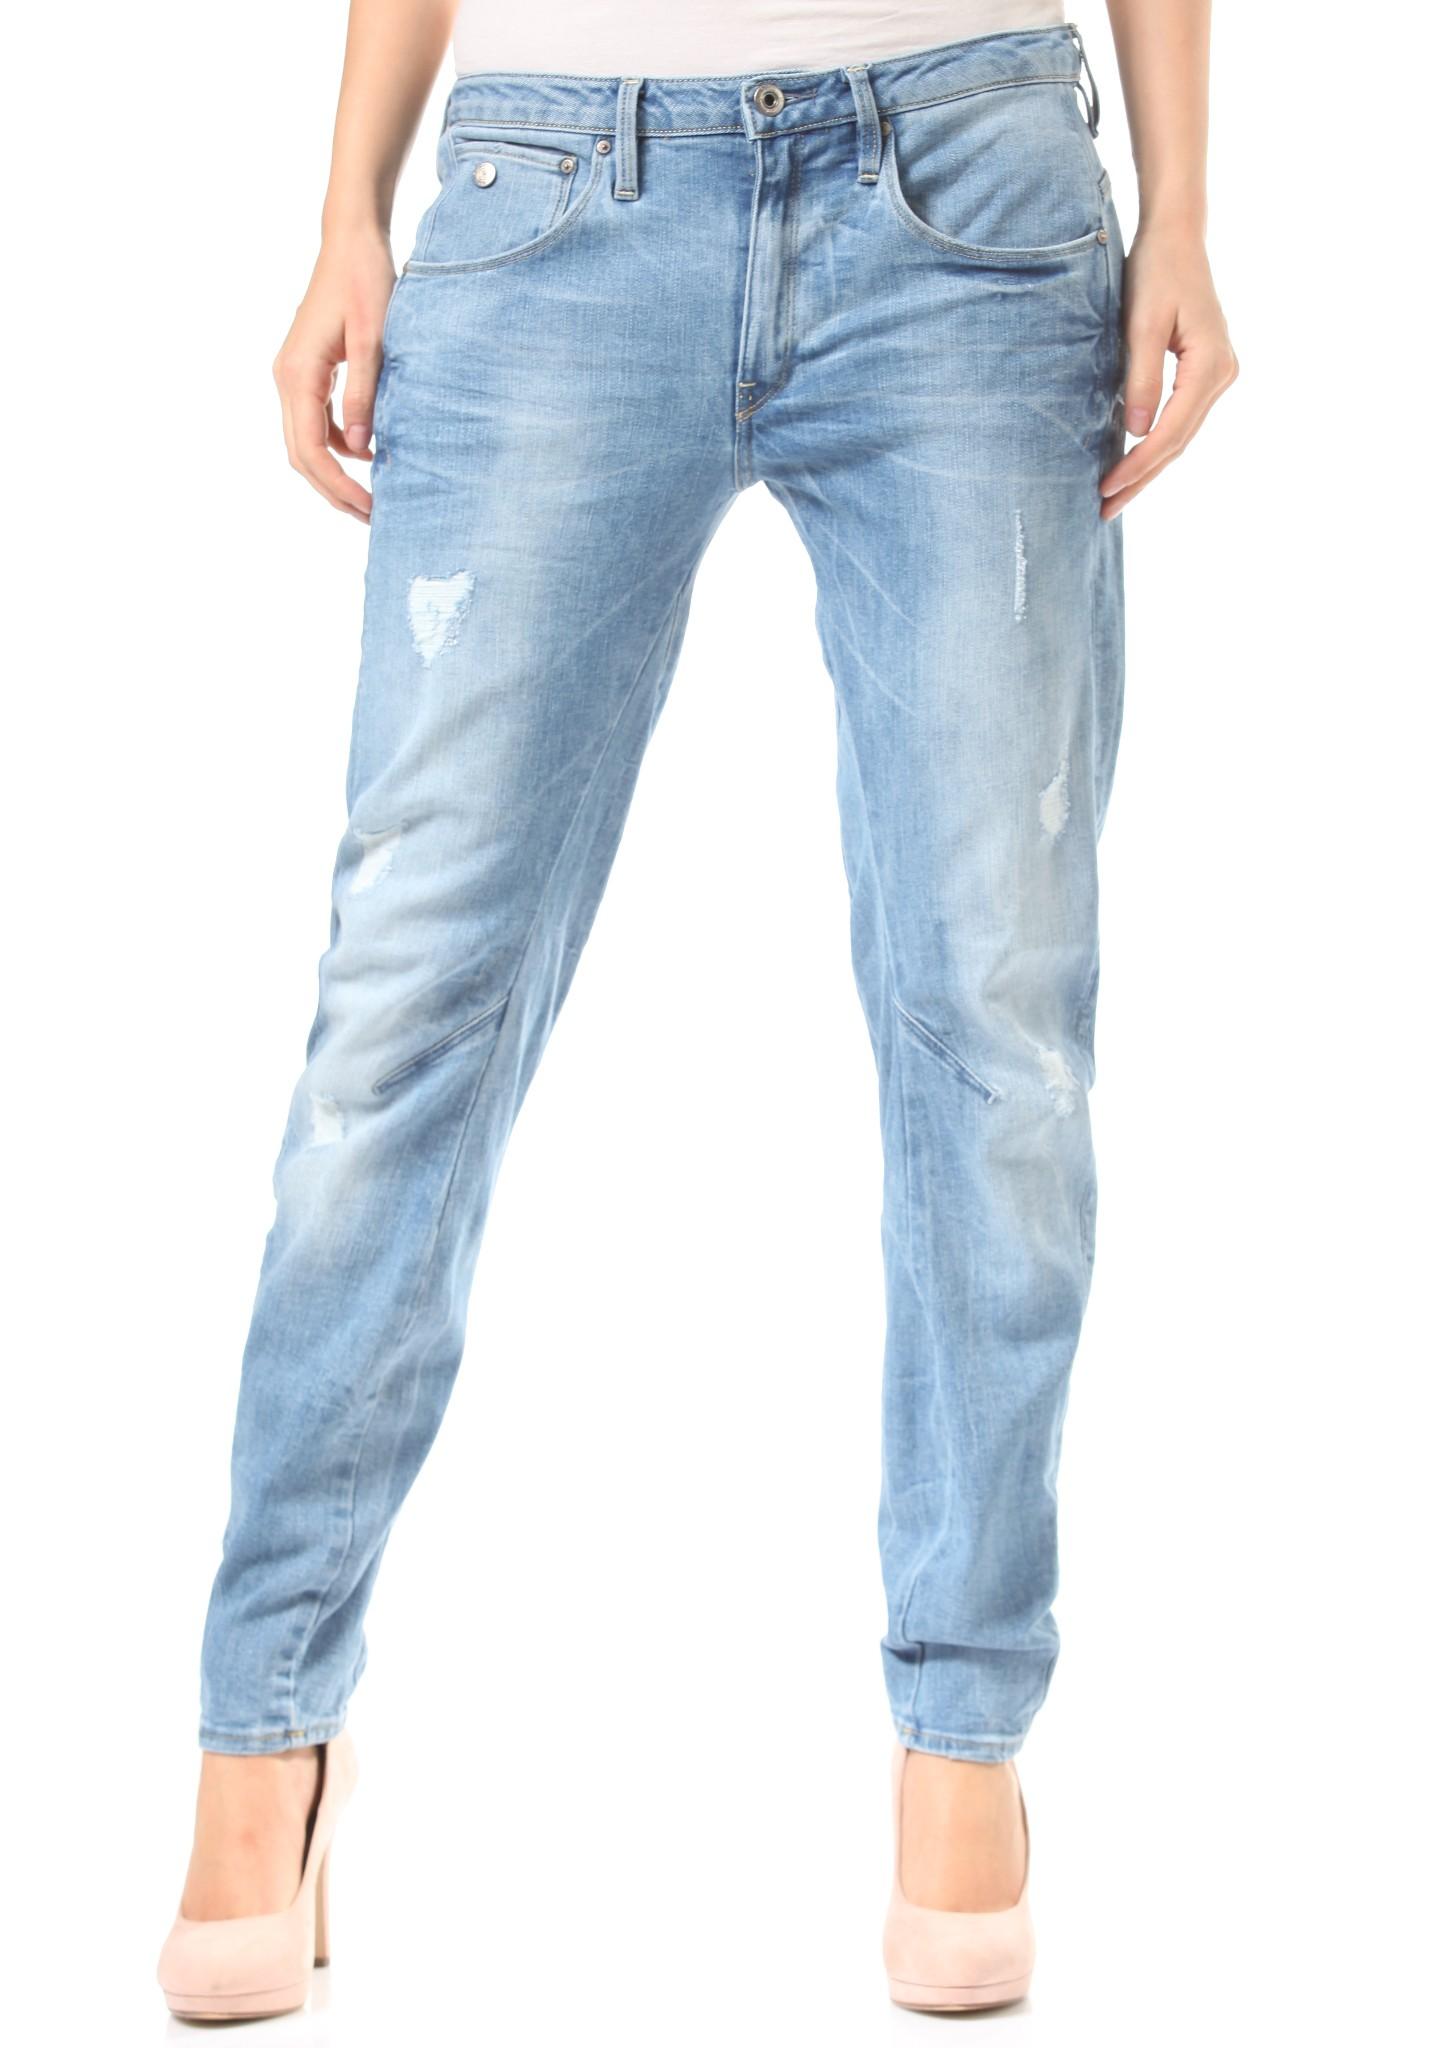 neu g star arc 3d low boyfriend binsk superstretch damen jeans hose. Black Bedroom Furniture Sets. Home Design Ideas